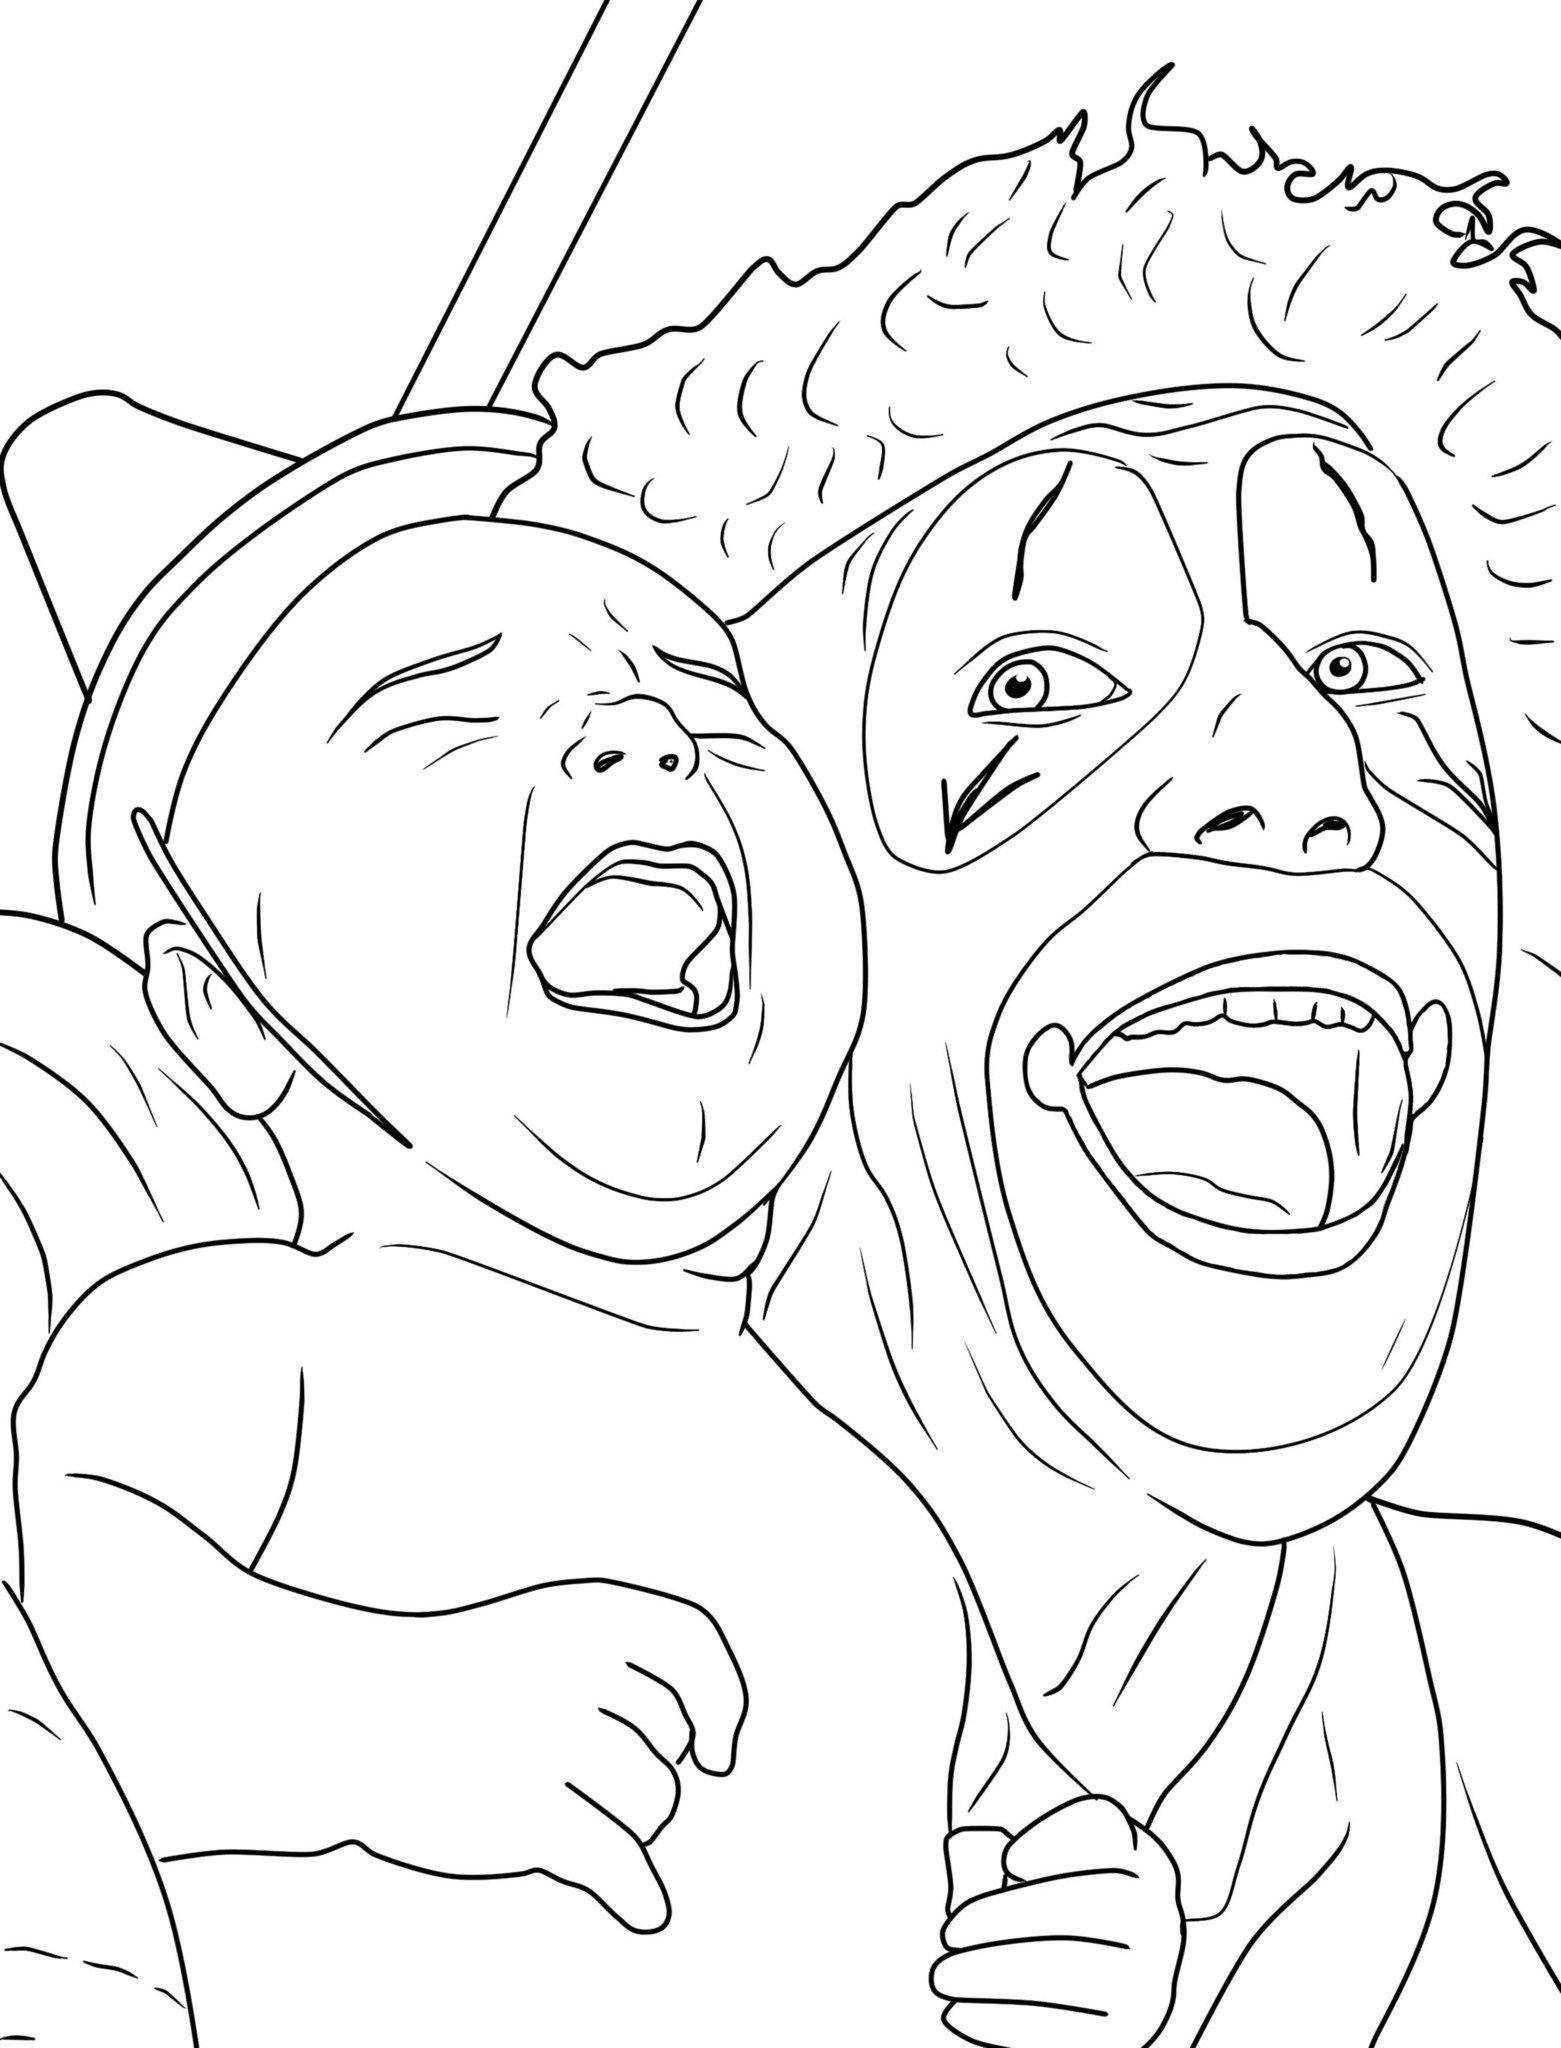 1561x2048 Creepy Clown Adult Coloring Book Creepy Clown, Coloring Books